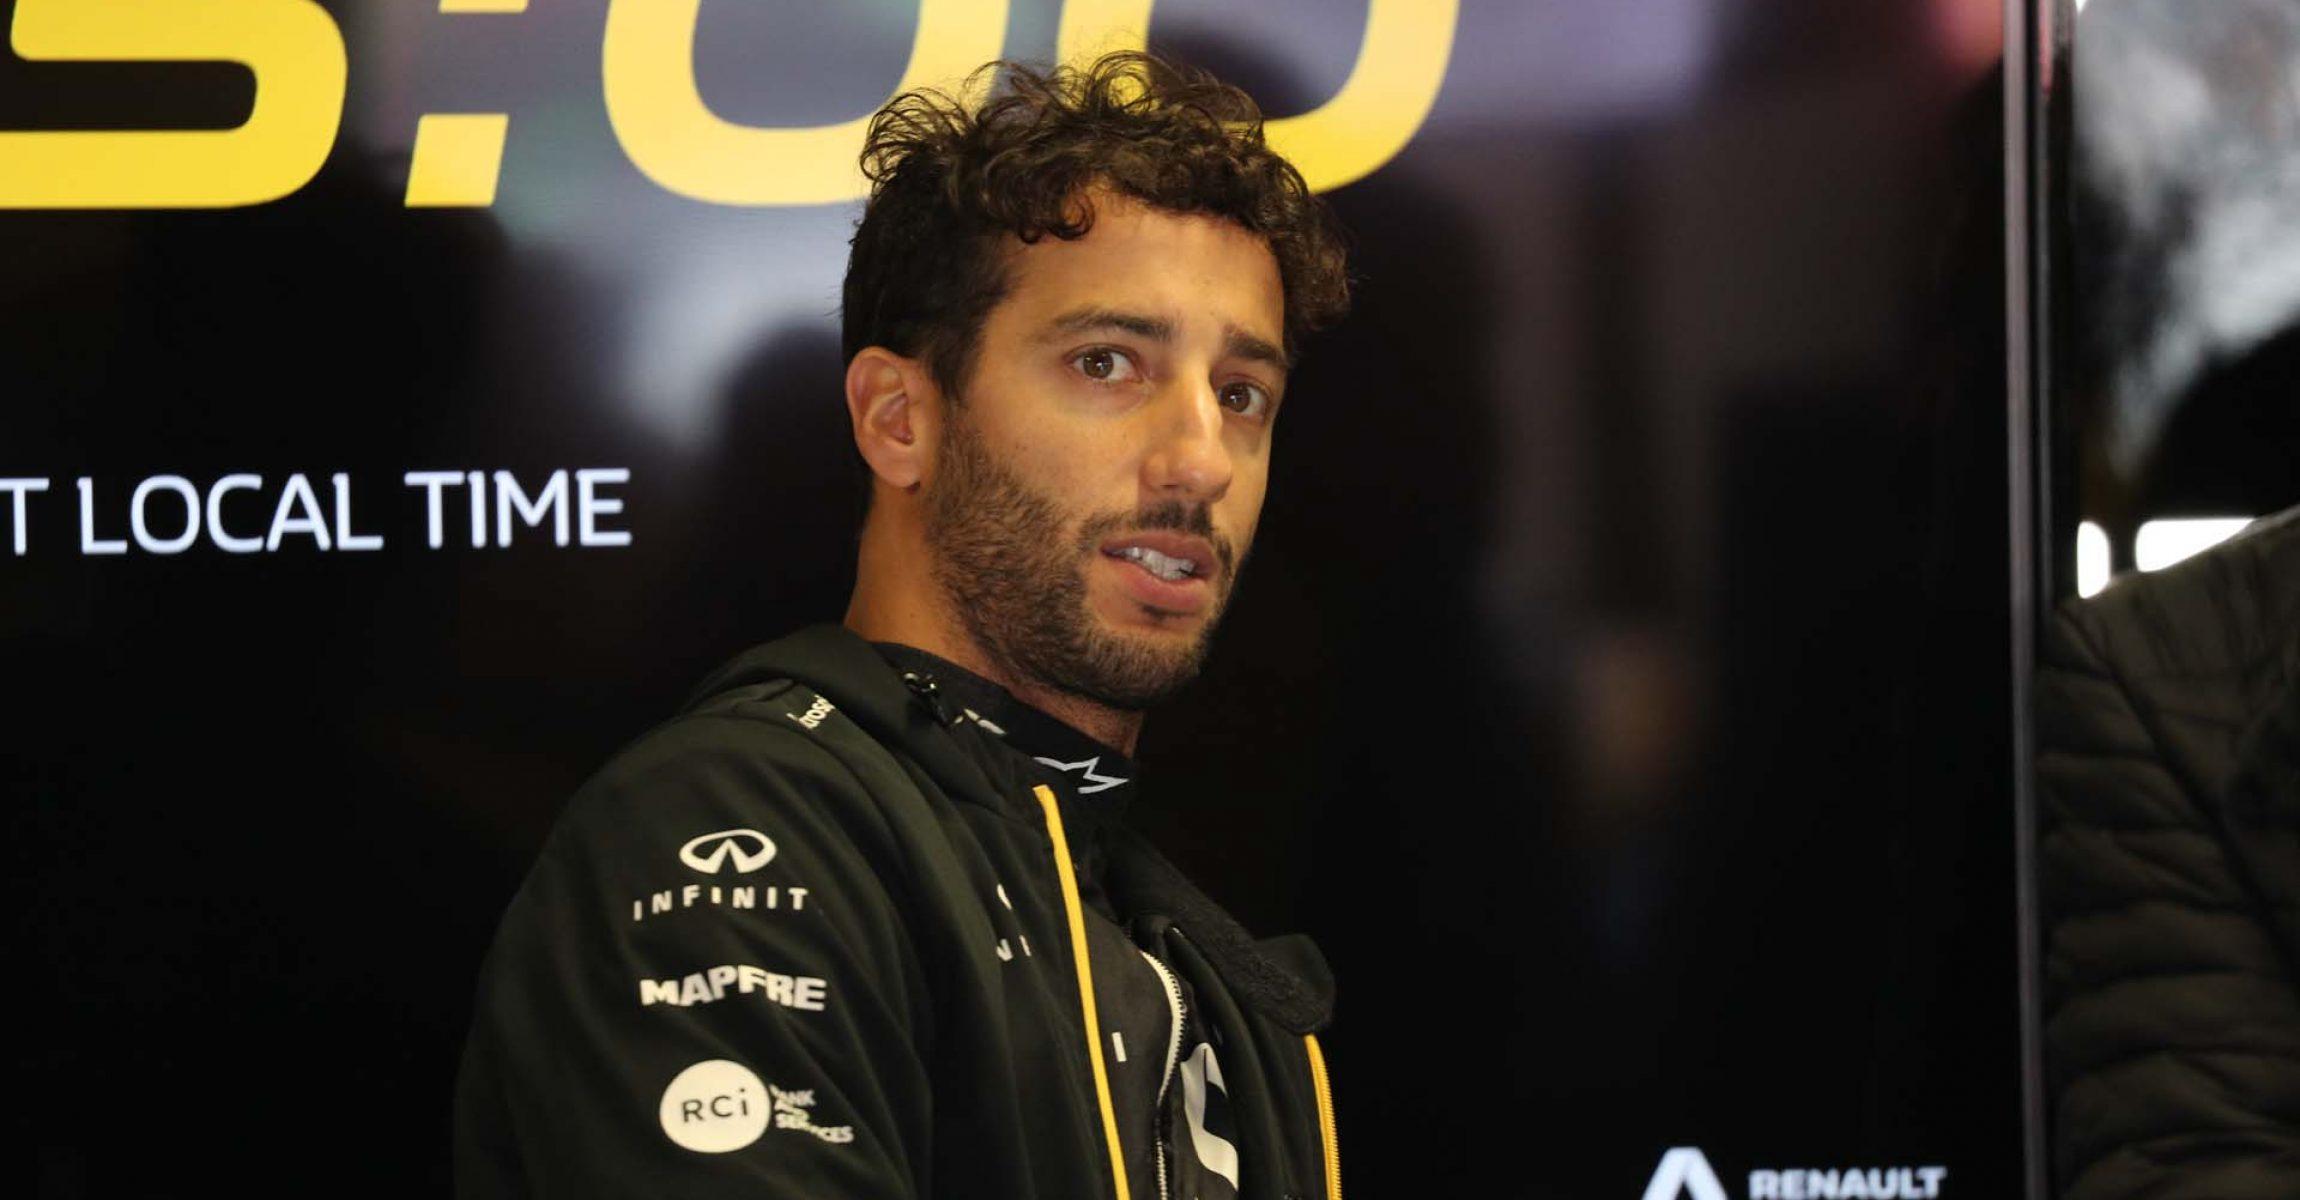 Italy, Italian Grand Prix 2019, Monza,  Daniel Ricciardo, Renault